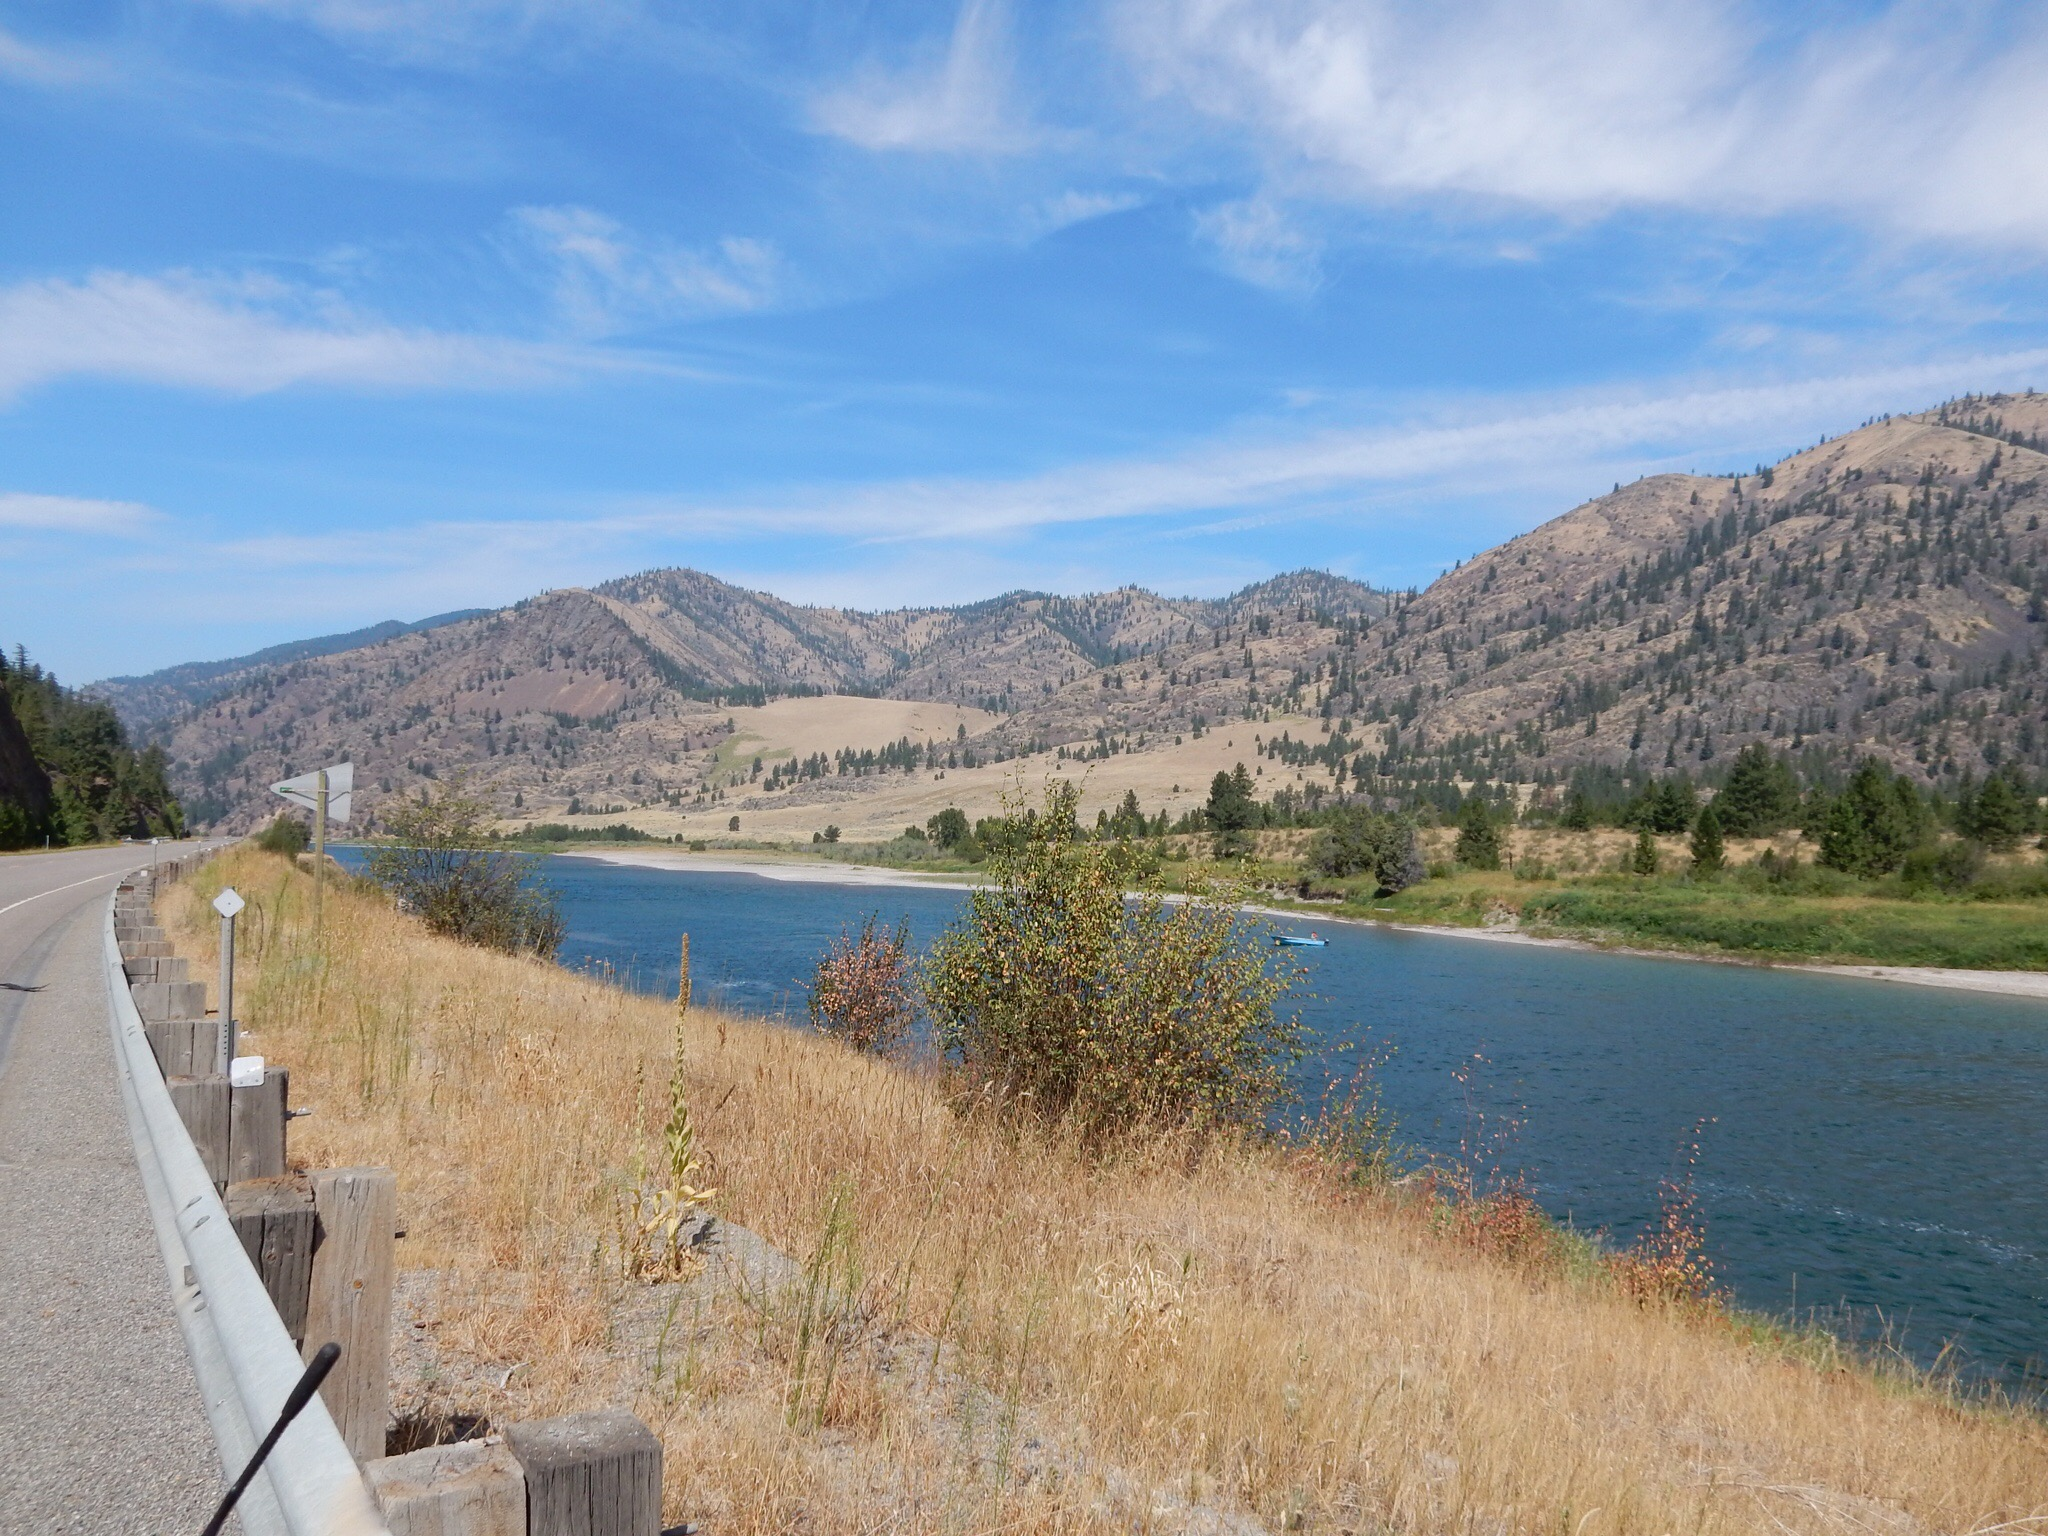 Looking downriver on Flathead River along Montana highway 200.